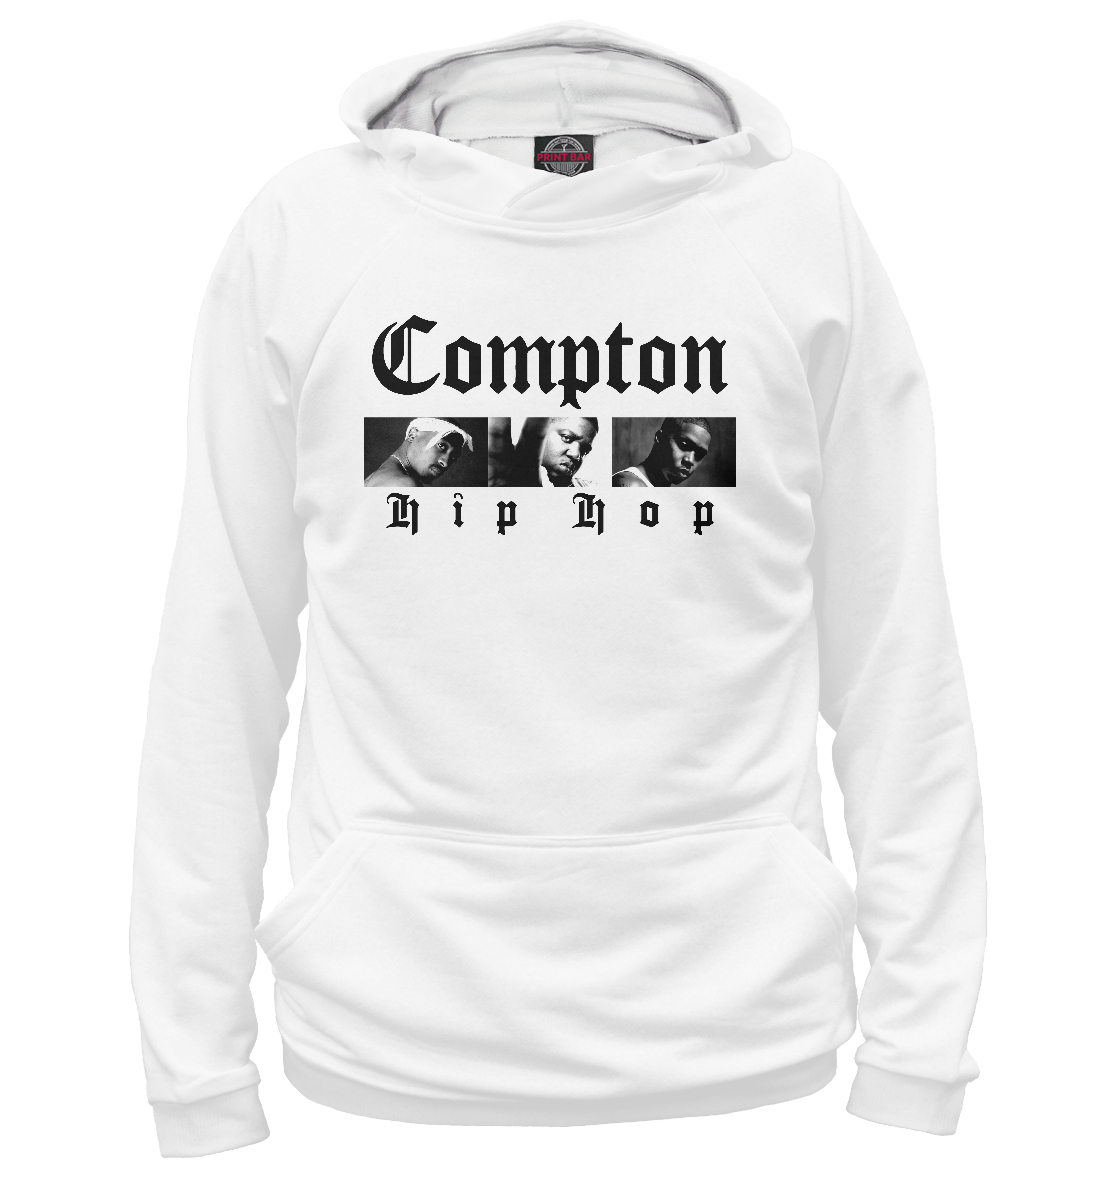 Compton недорого